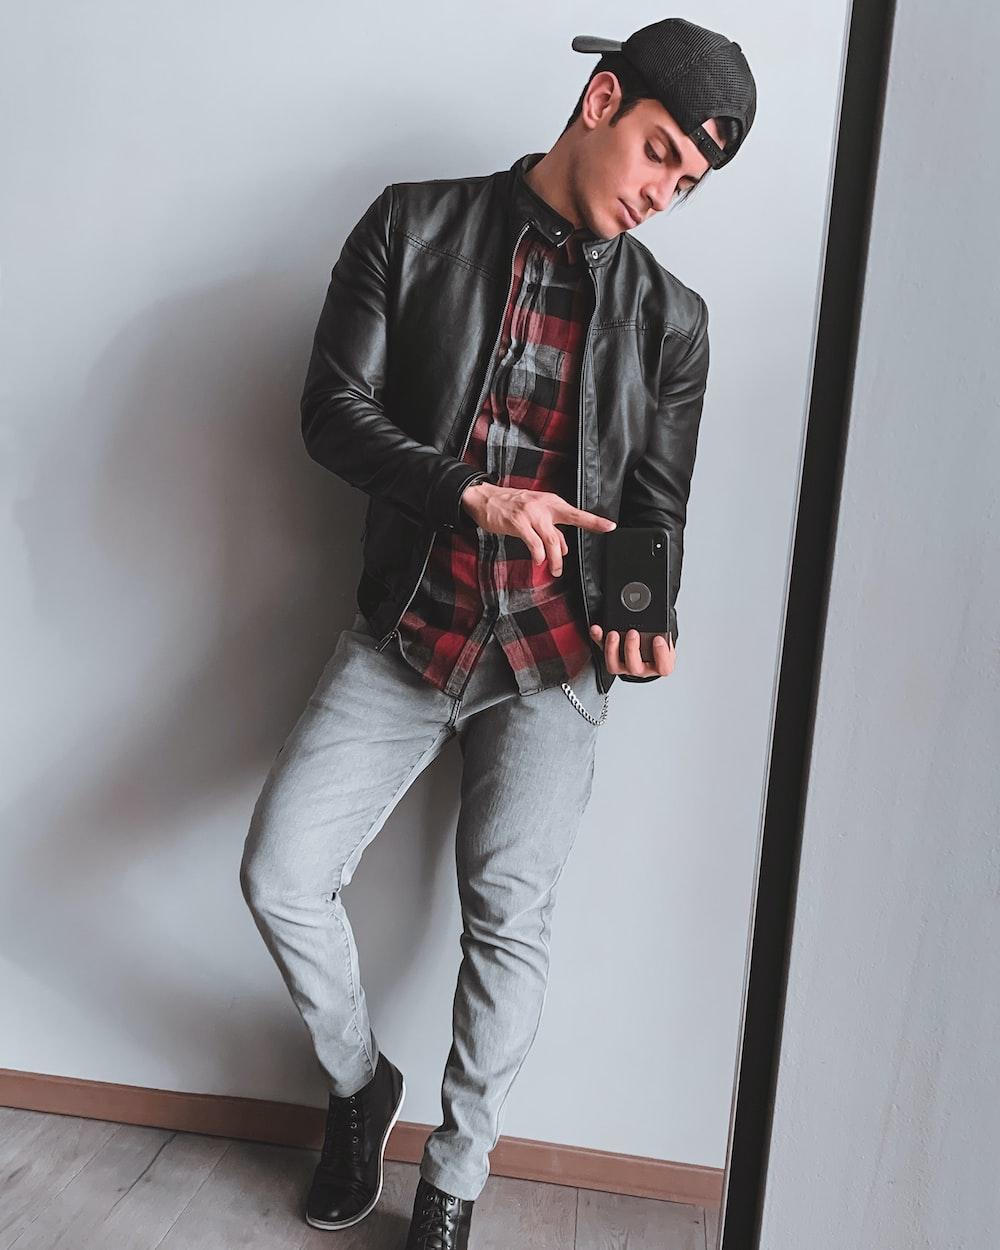 man in black leather jacket and blue denim jeans holding black smartphone